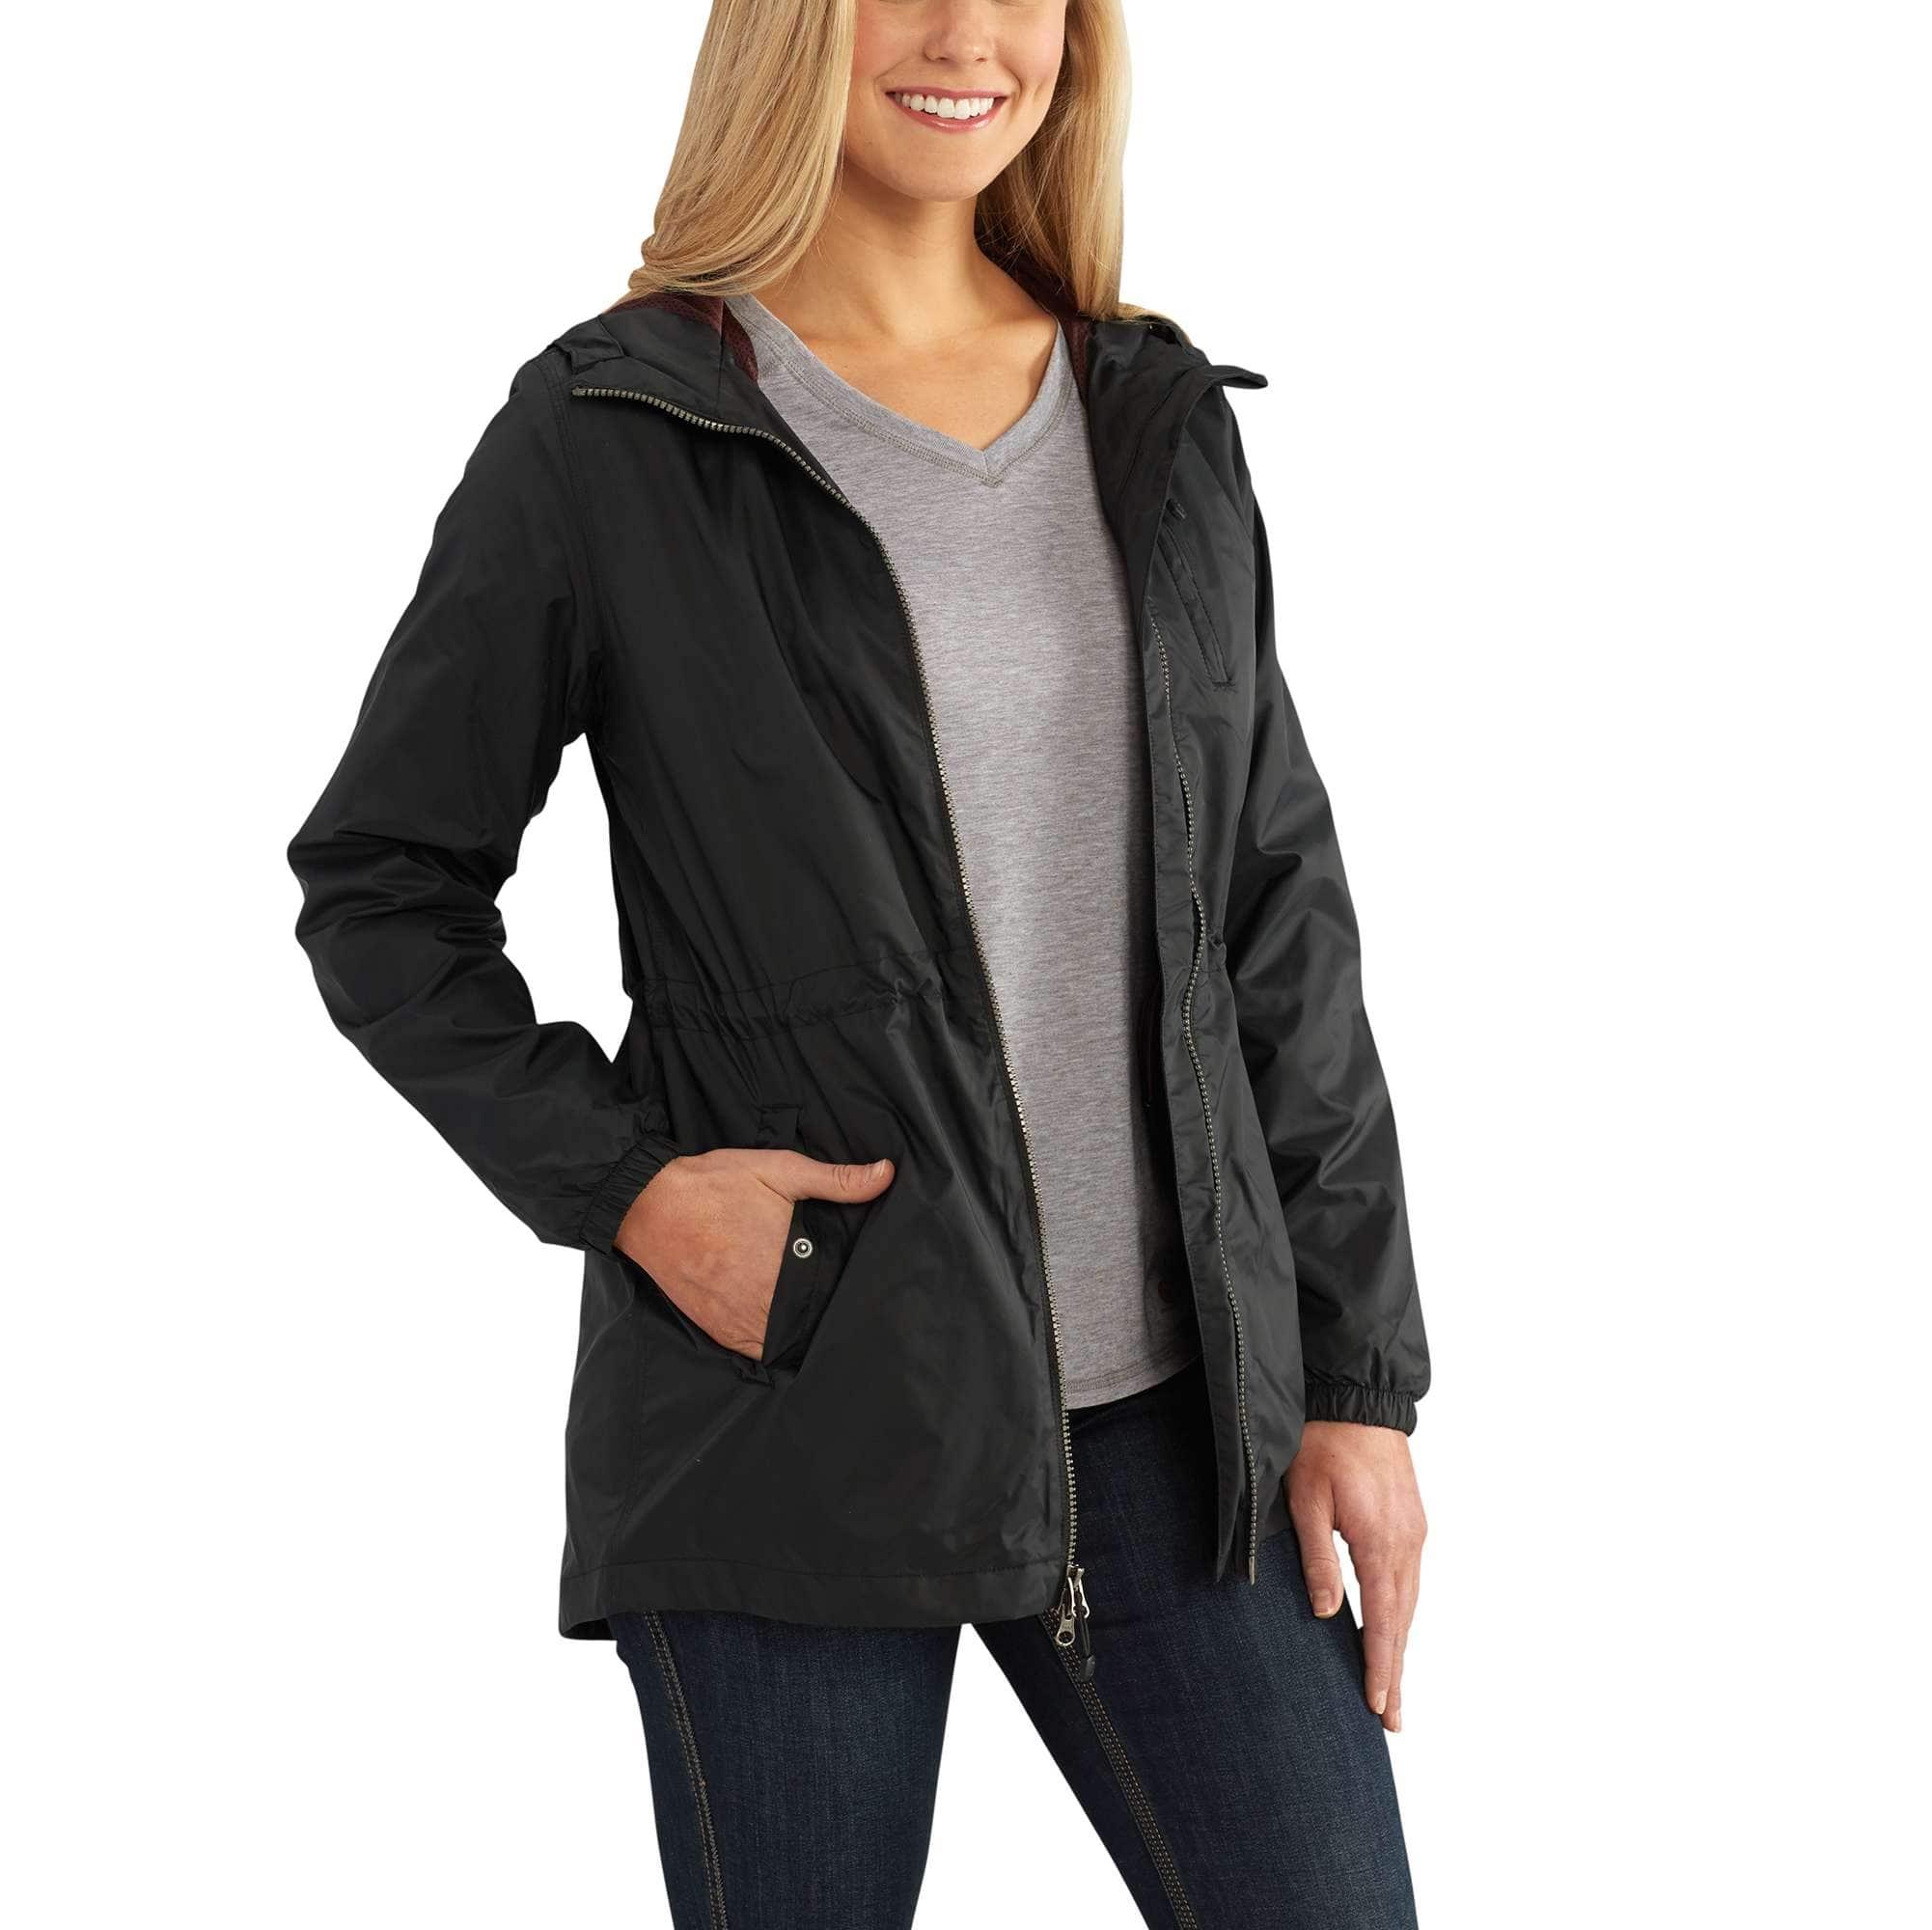 4b2fbdc30b1 Women s Rockford Jacket 102388